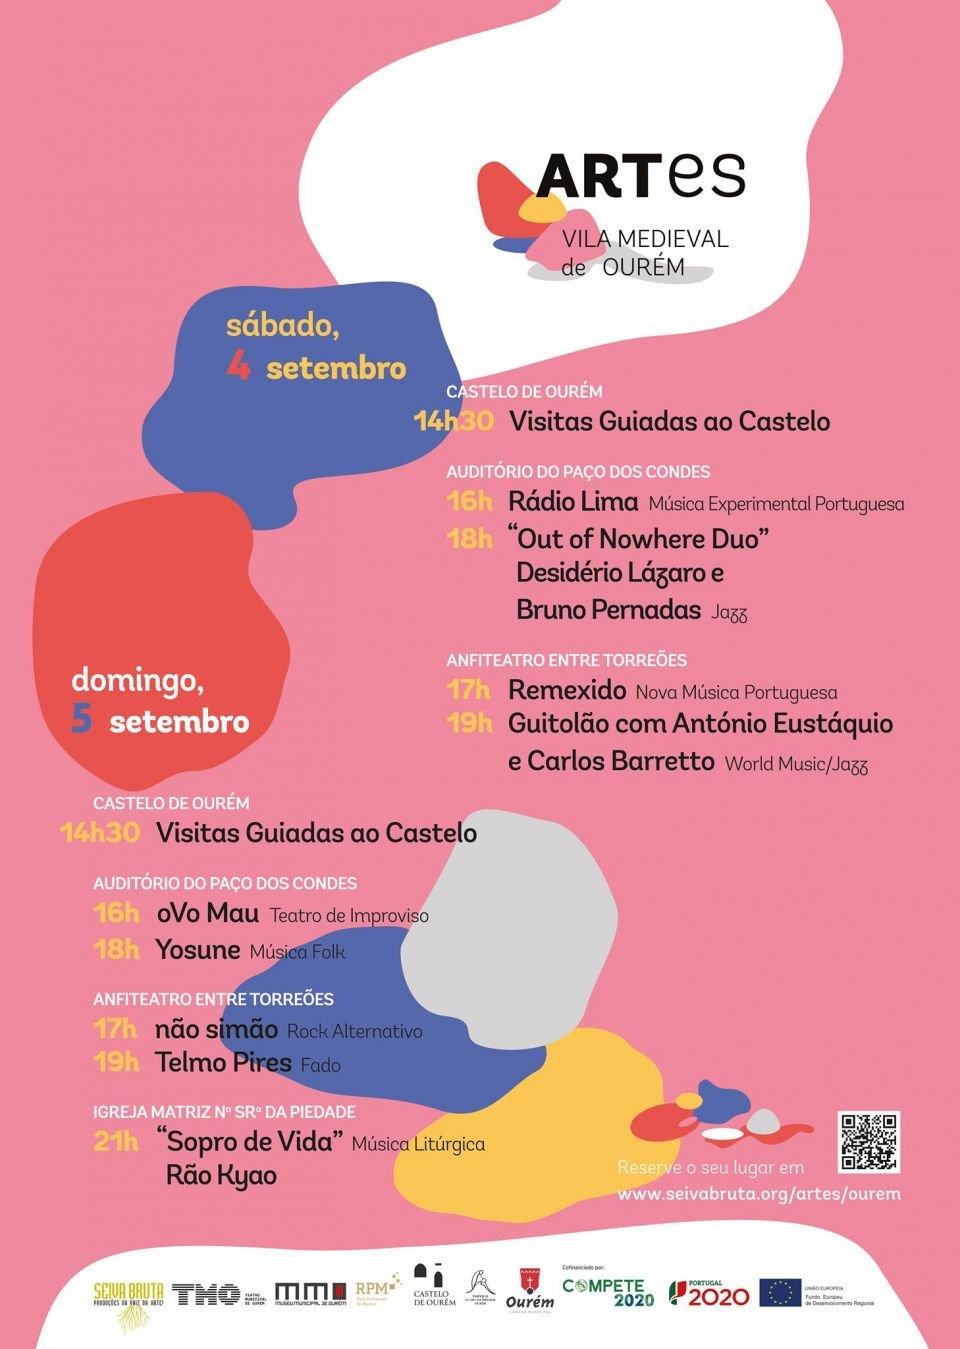 FESTIVAL ARTes - VILA MEDIEVAL DE OURÉM | 'SOPRO DE VIDA' Música Litúrgica…